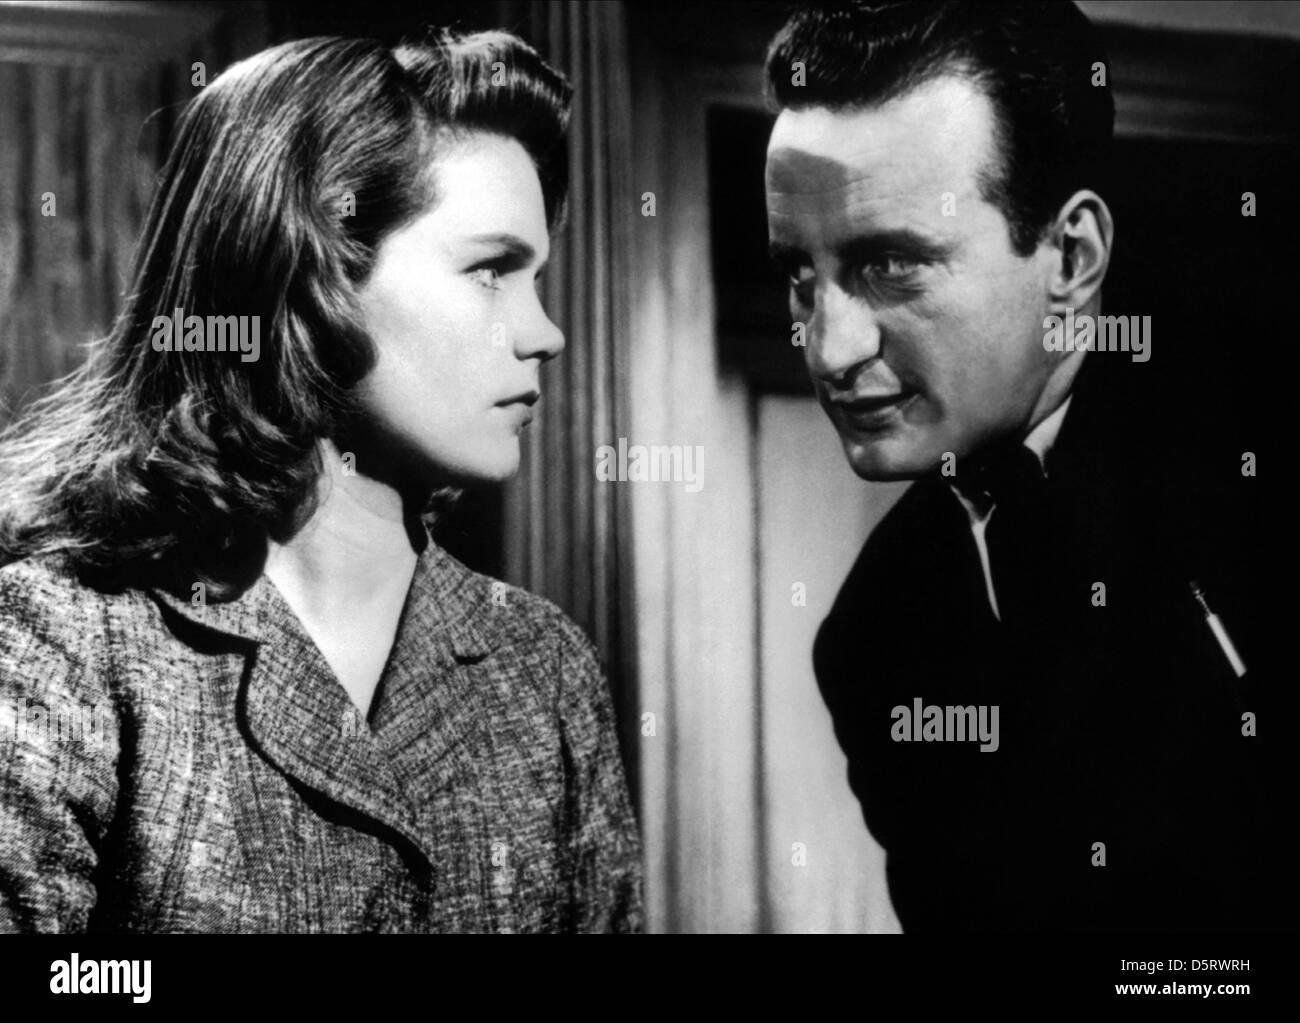 LEE REMICK & GEORGE C. SCOTT ANATOMY OF A MURDER (1959 Stock Photo ...